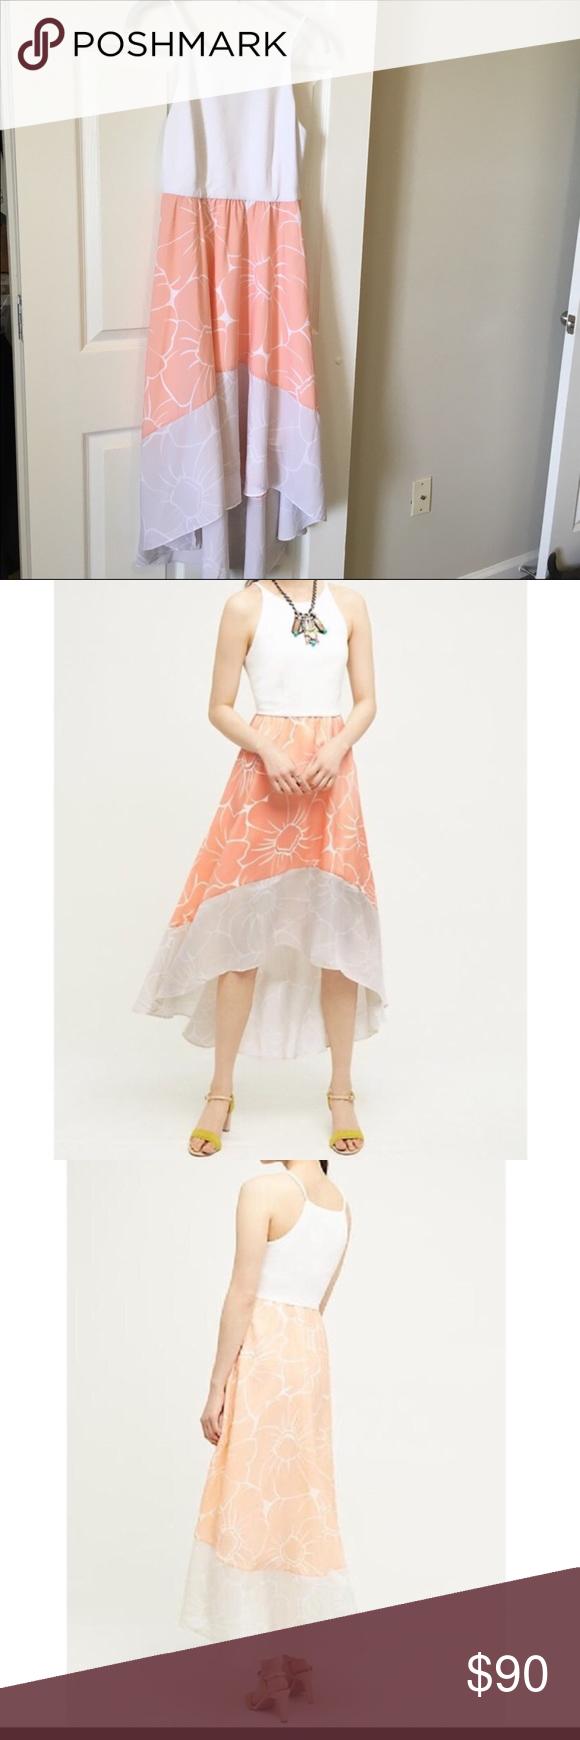 96431856ffbc Anthropologie High Low Peachy Dress by Hutch RARE Anthropologie High Low  Peachy Dress by Hutch RARE